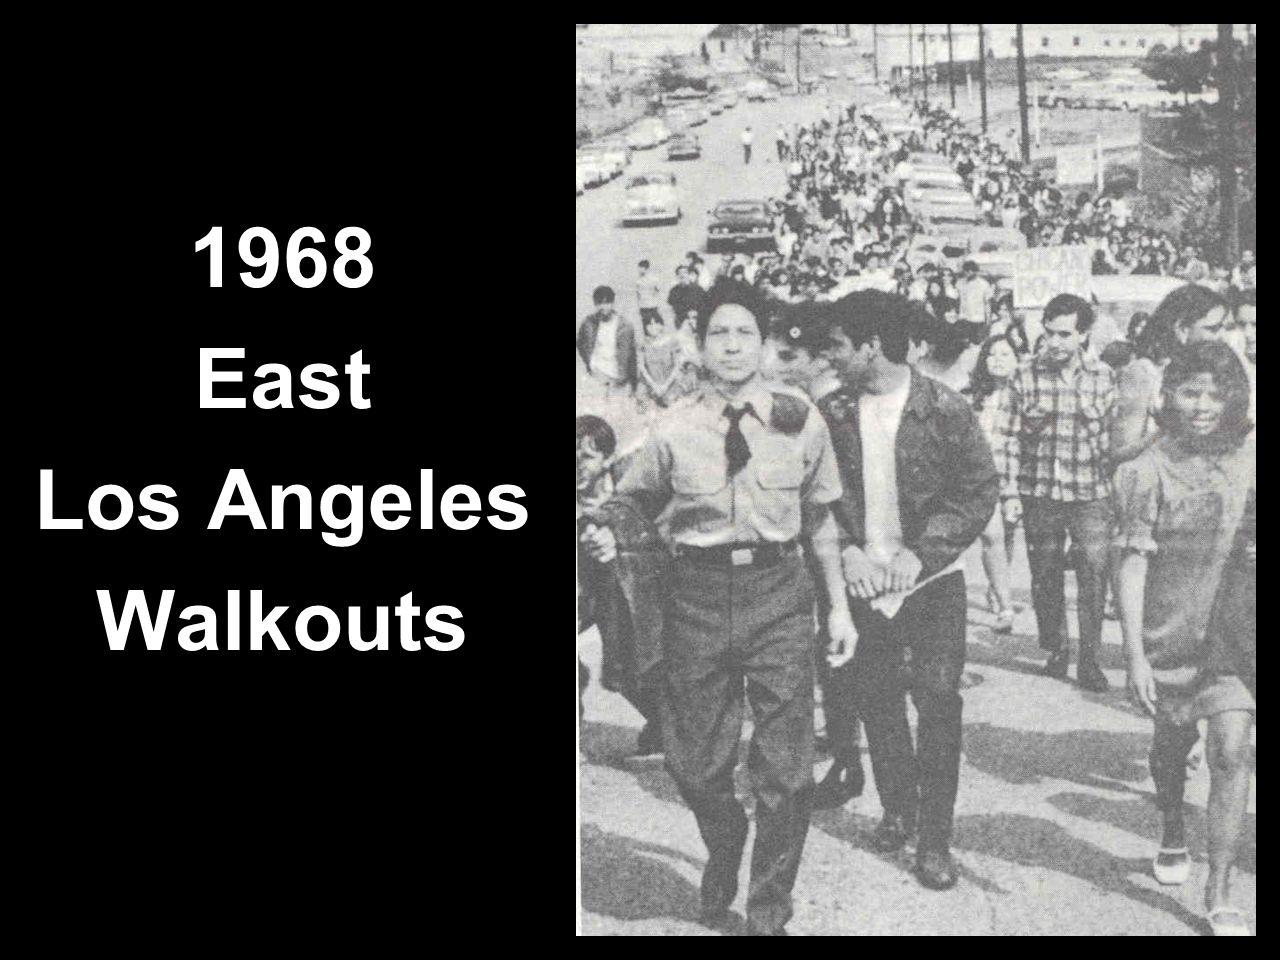 1968 East Los Angeles Walkouts